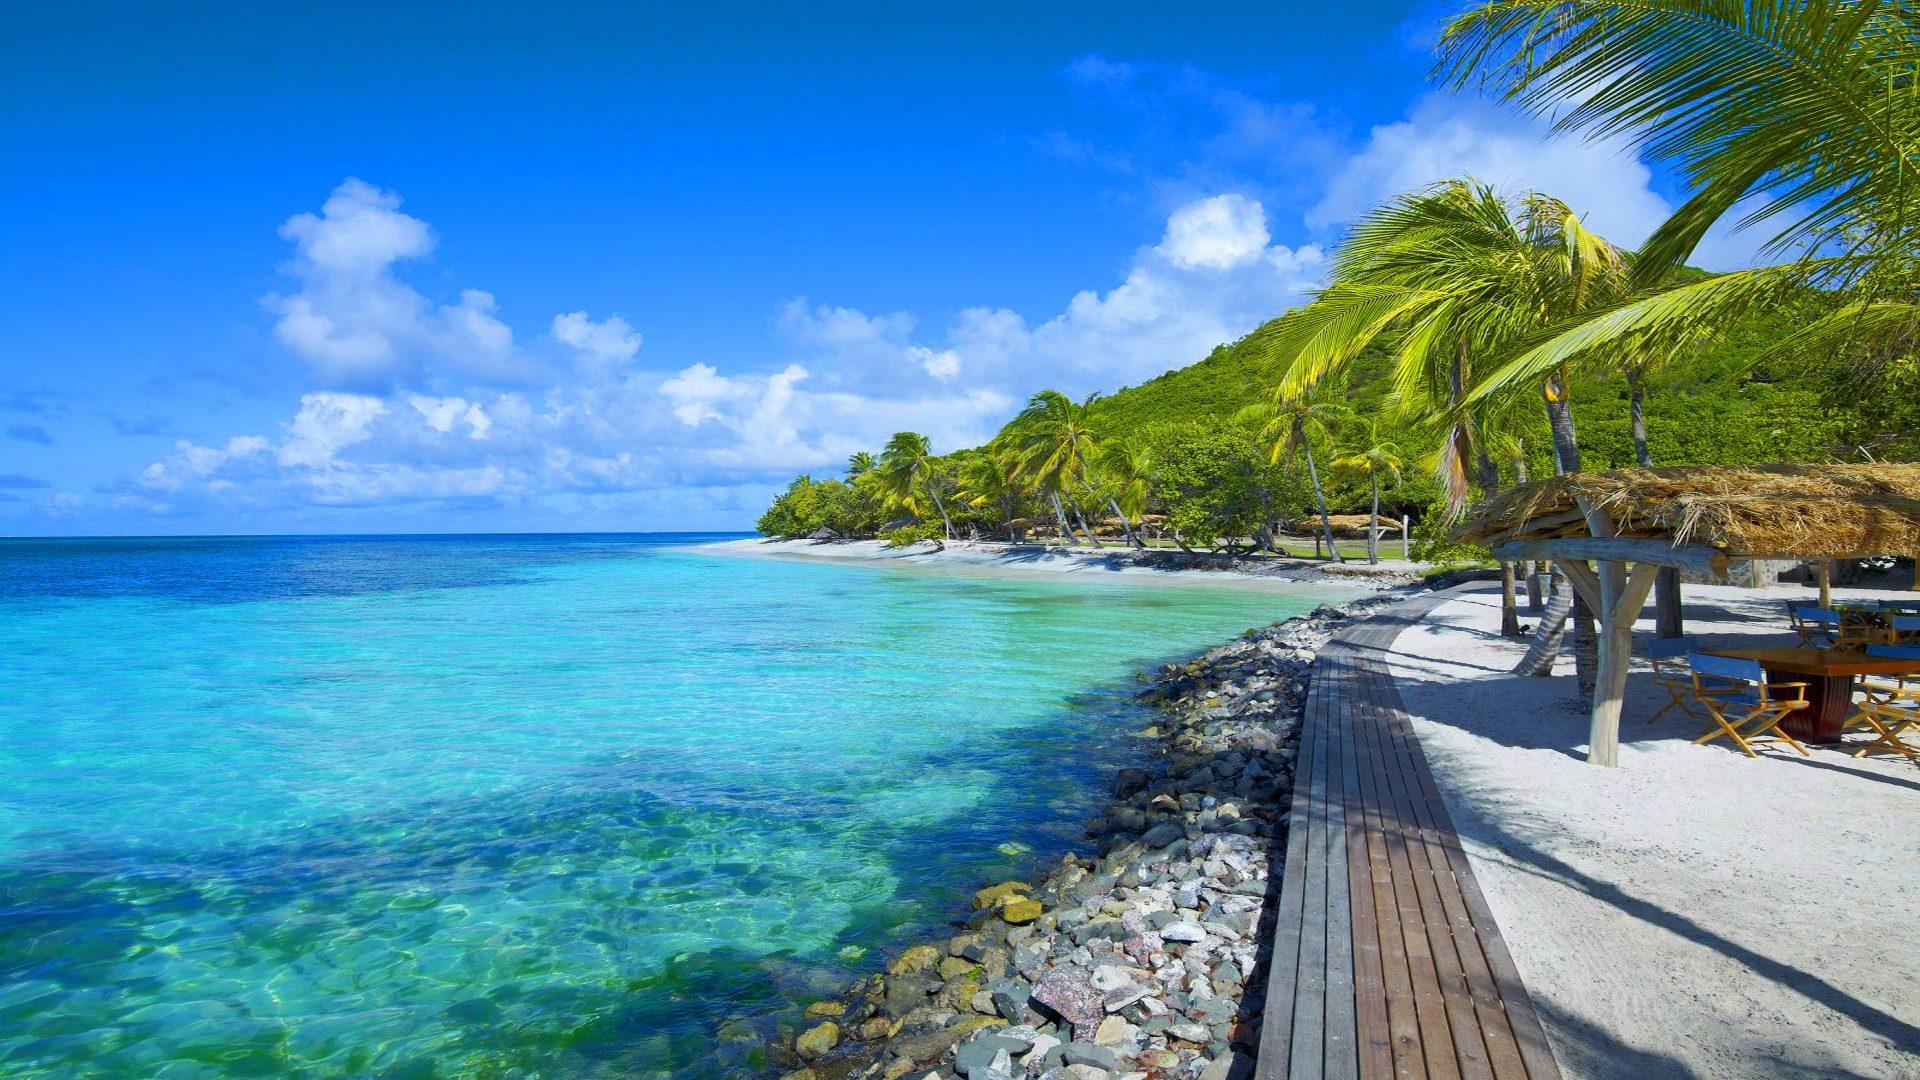 Rainforest Wallpaper Hd Petit St Vincent Islands From Caribbean Islands 1920 1080 2105256 Hd Wallpaper Backgrounds Download